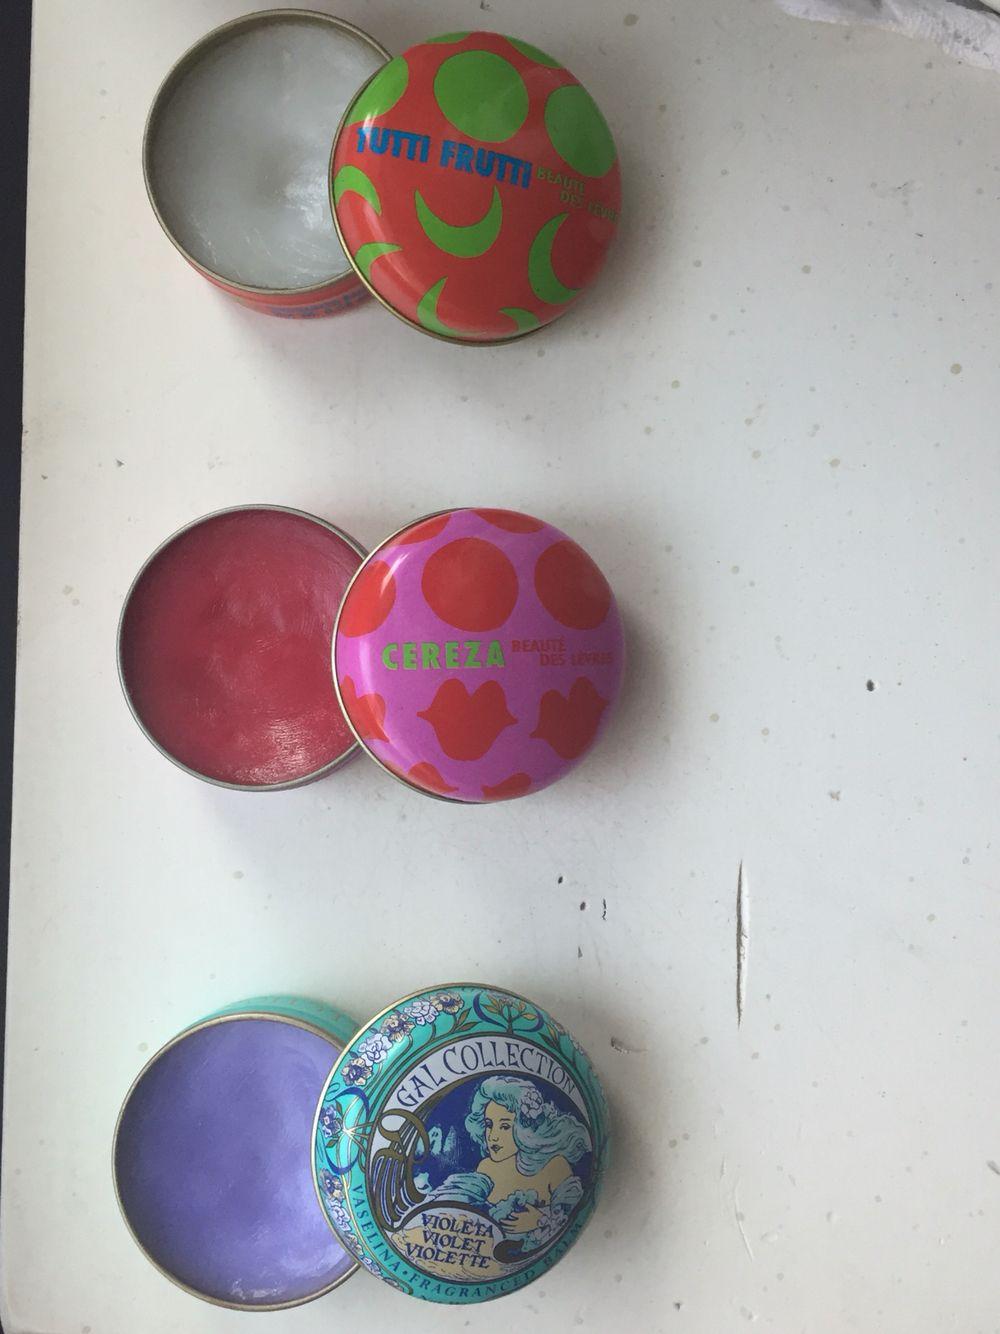 These Are My Agatha Ruiz De La Prada Vaselina Gal Collection Lip